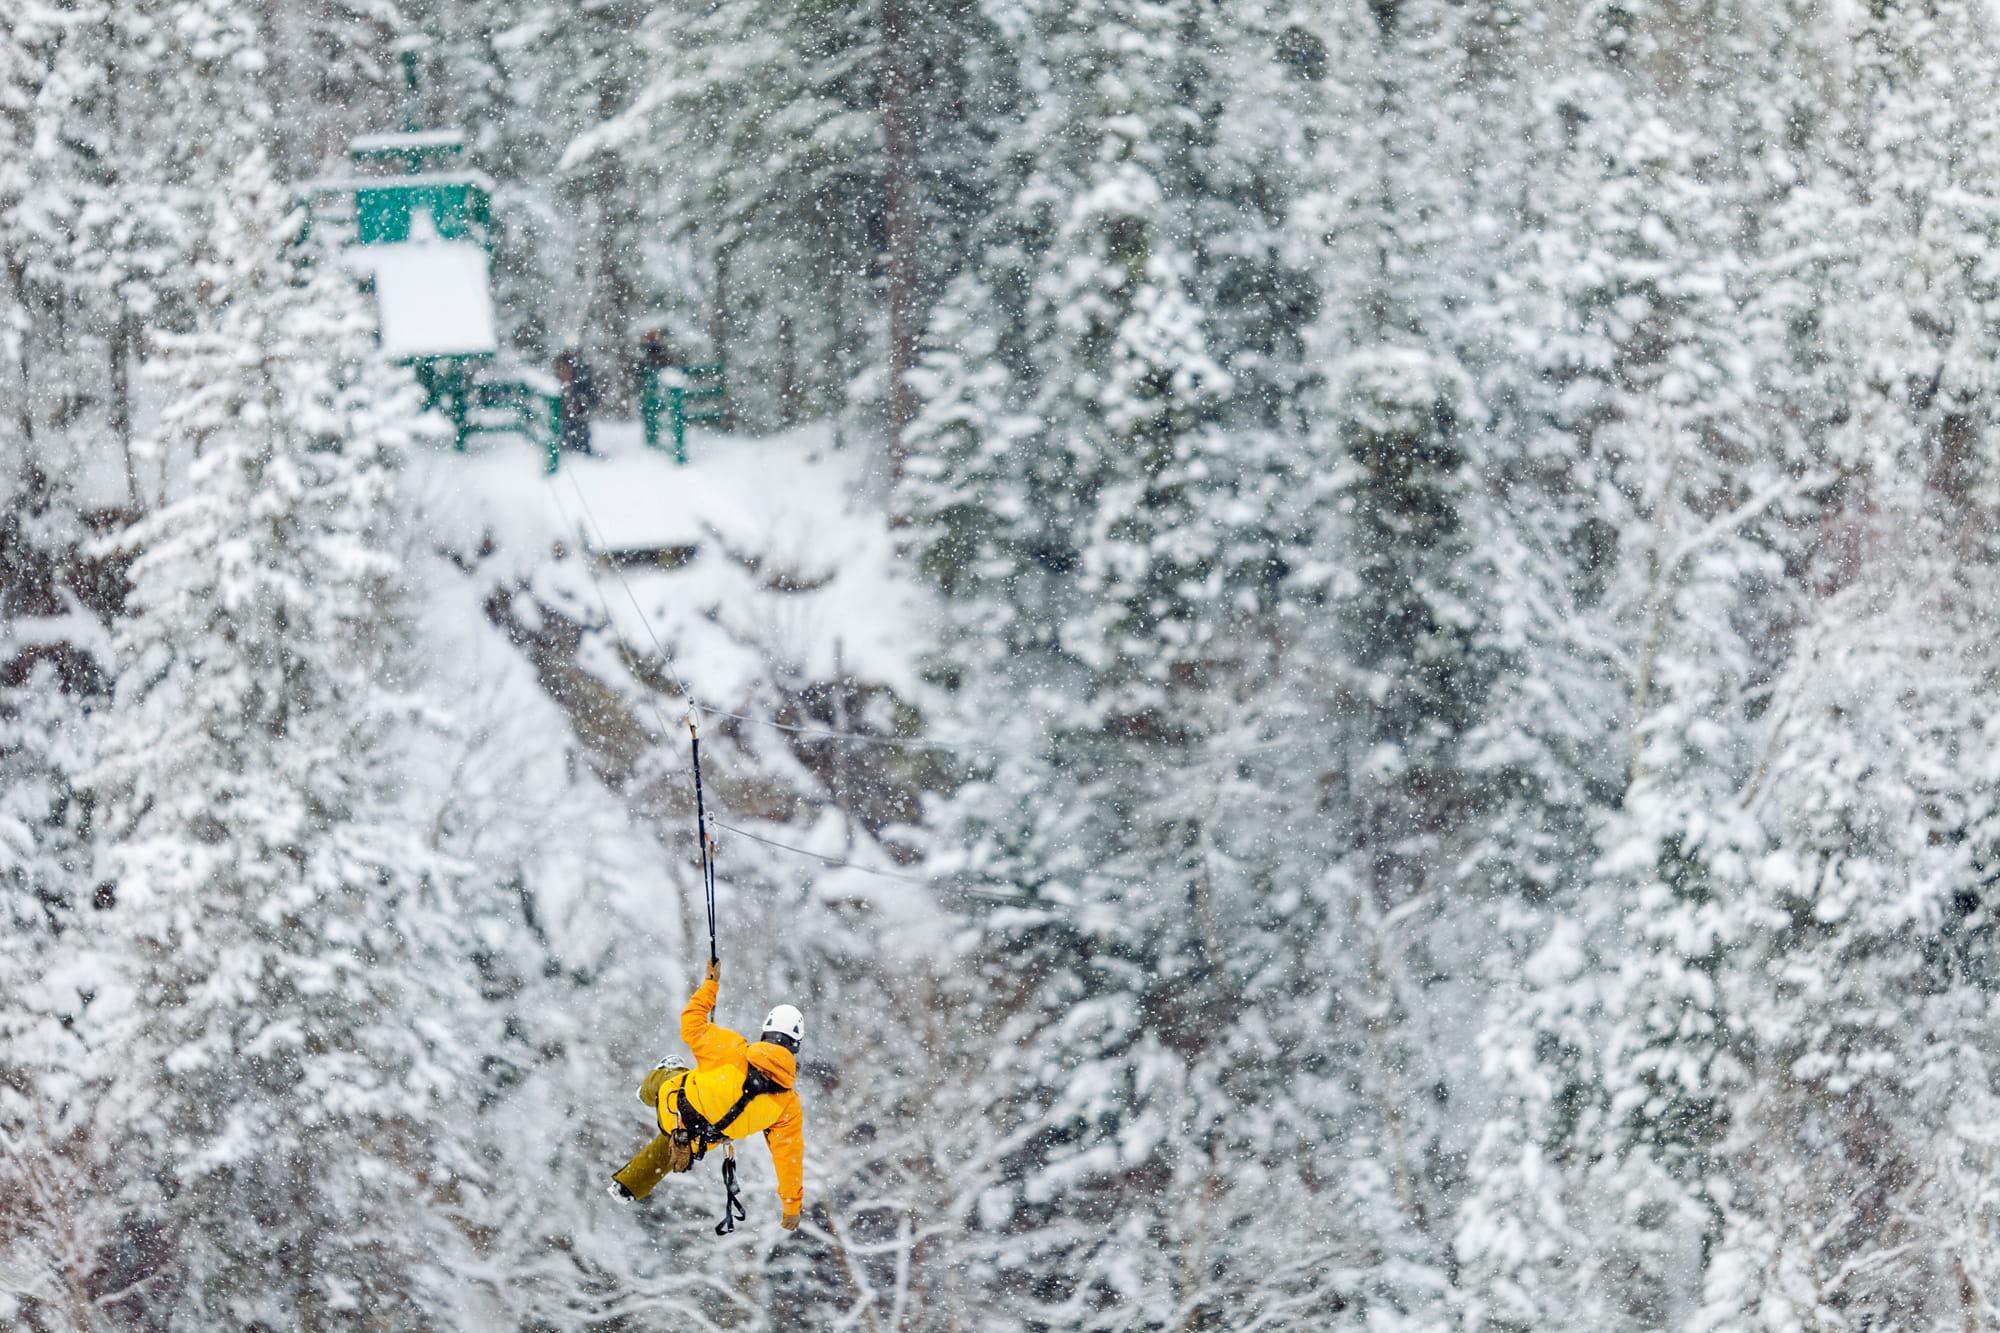 Marble Mountain Resort Ziplining